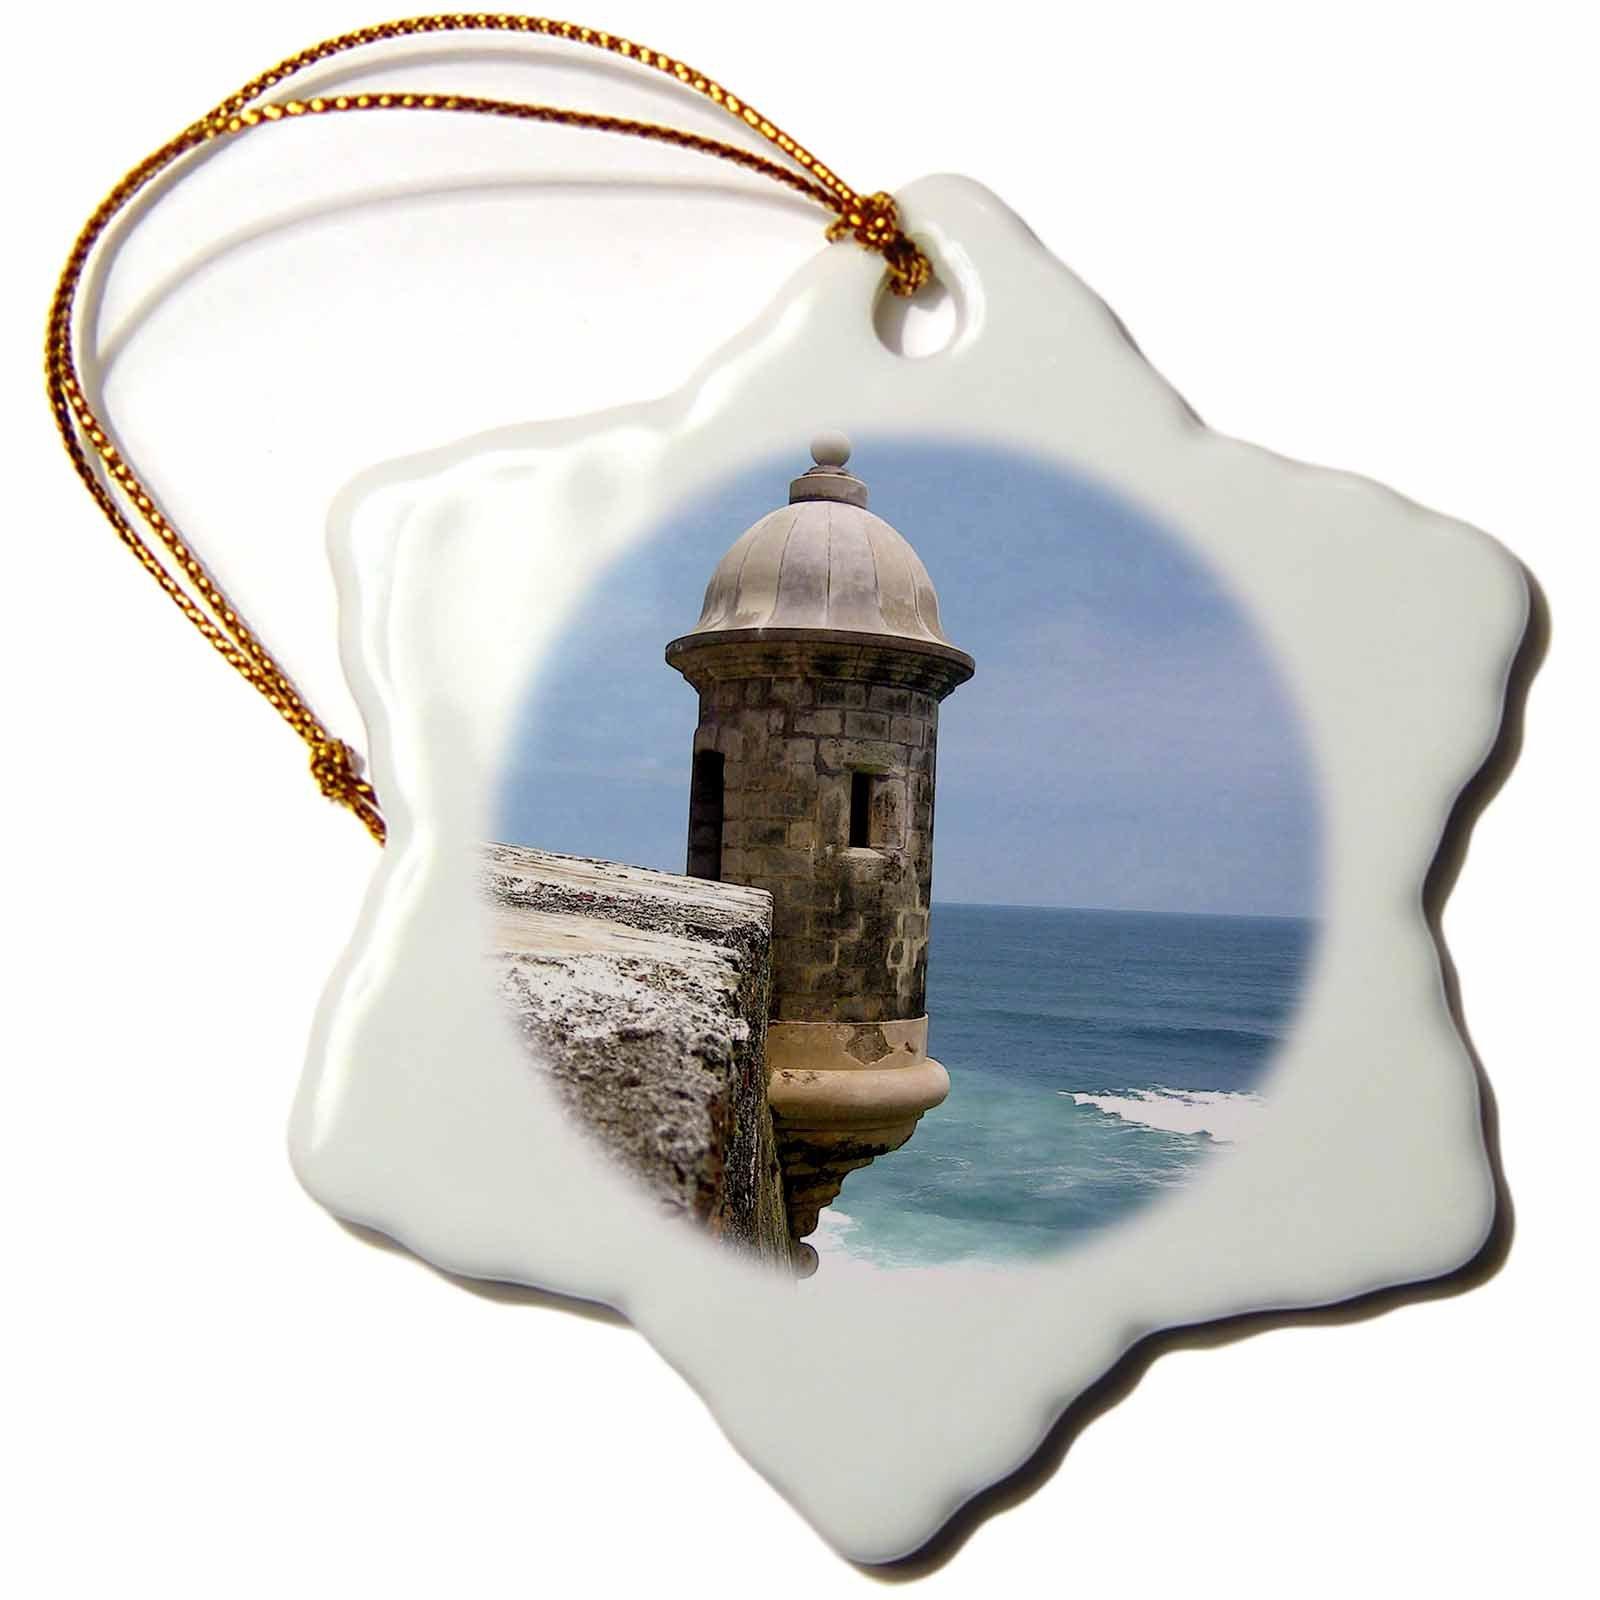 3dRose orn_72245_1 Puerto Rico San Juan Fort San Felipe del Morro Miva Stock Snowflake Decorative Hanging Ornament, Porcelain, 3-Inch